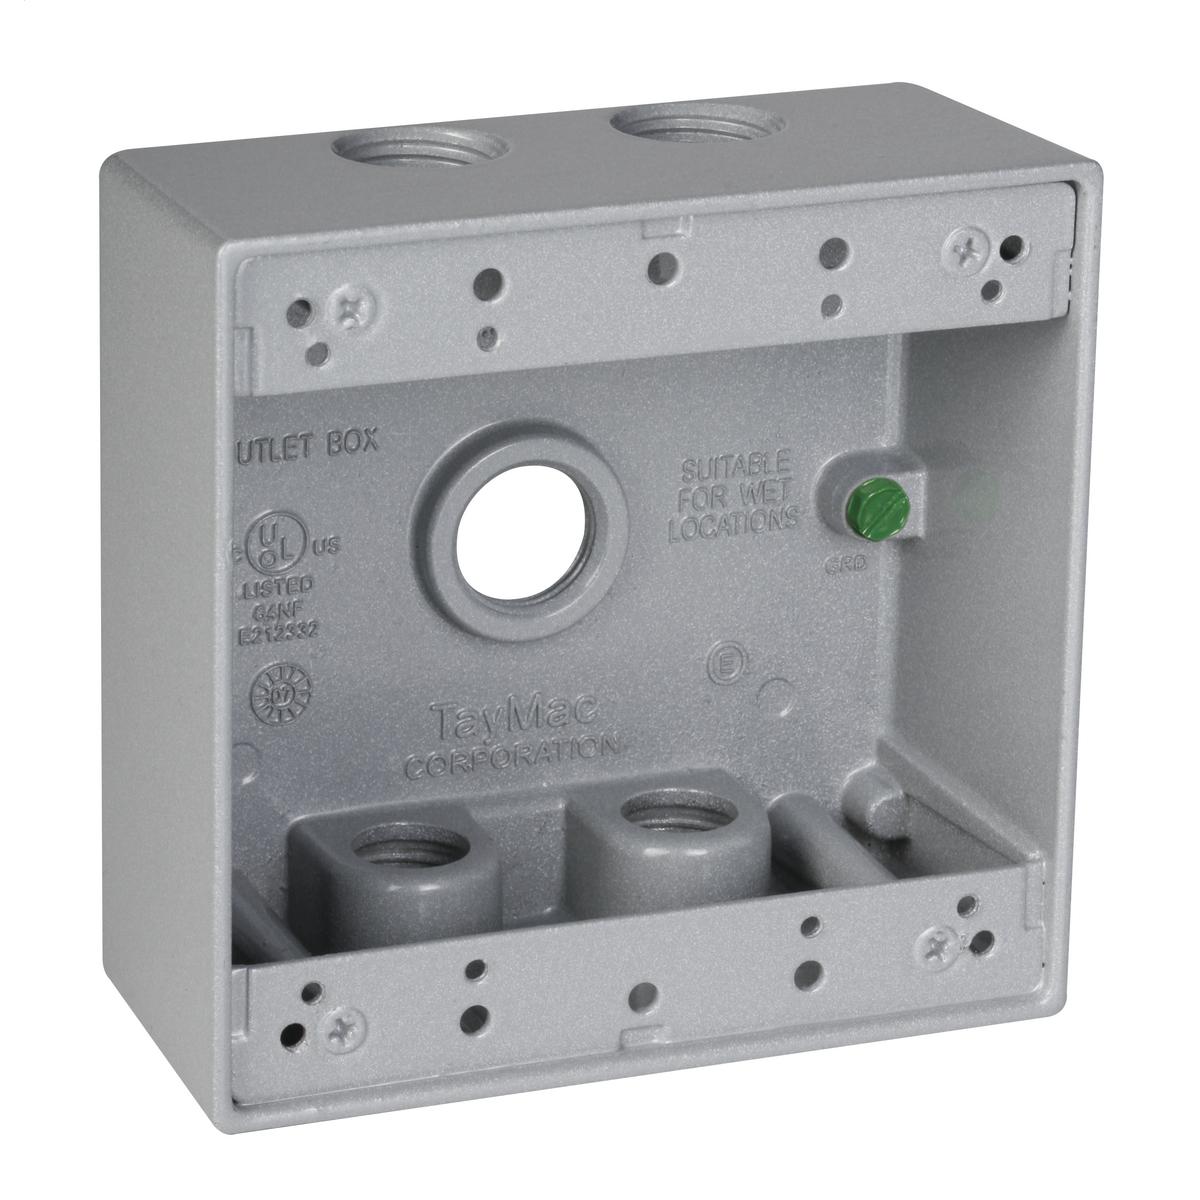 TMAC DB550S (5) 1/2 GRY 2G BOX